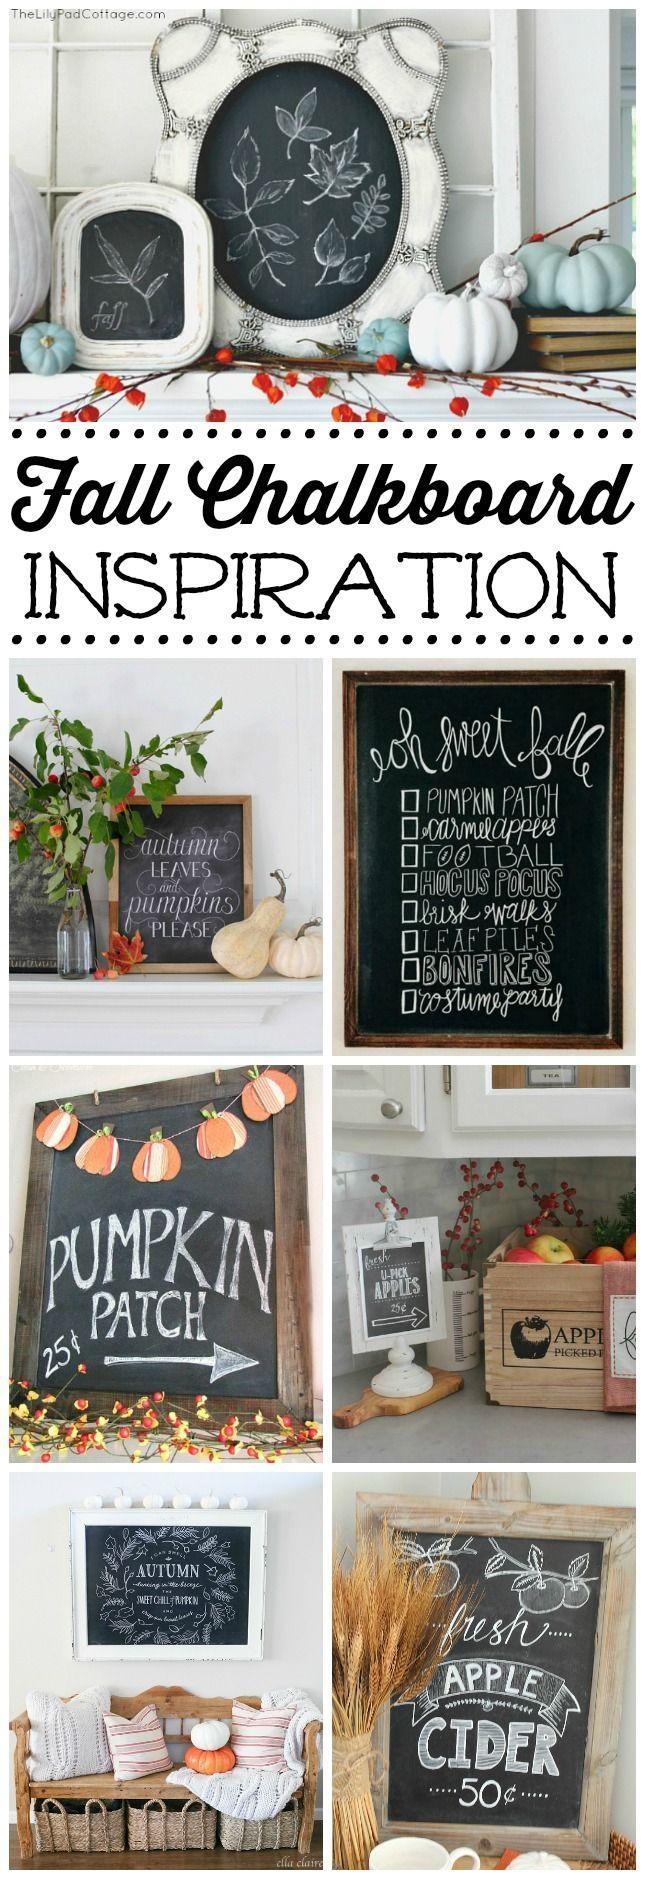 Best 25+ Fall Chalkboard Ideas On Pinterest   Fall Chalkboard Art Within Autumn  Inspired Wall Art (Image 8 of 20)